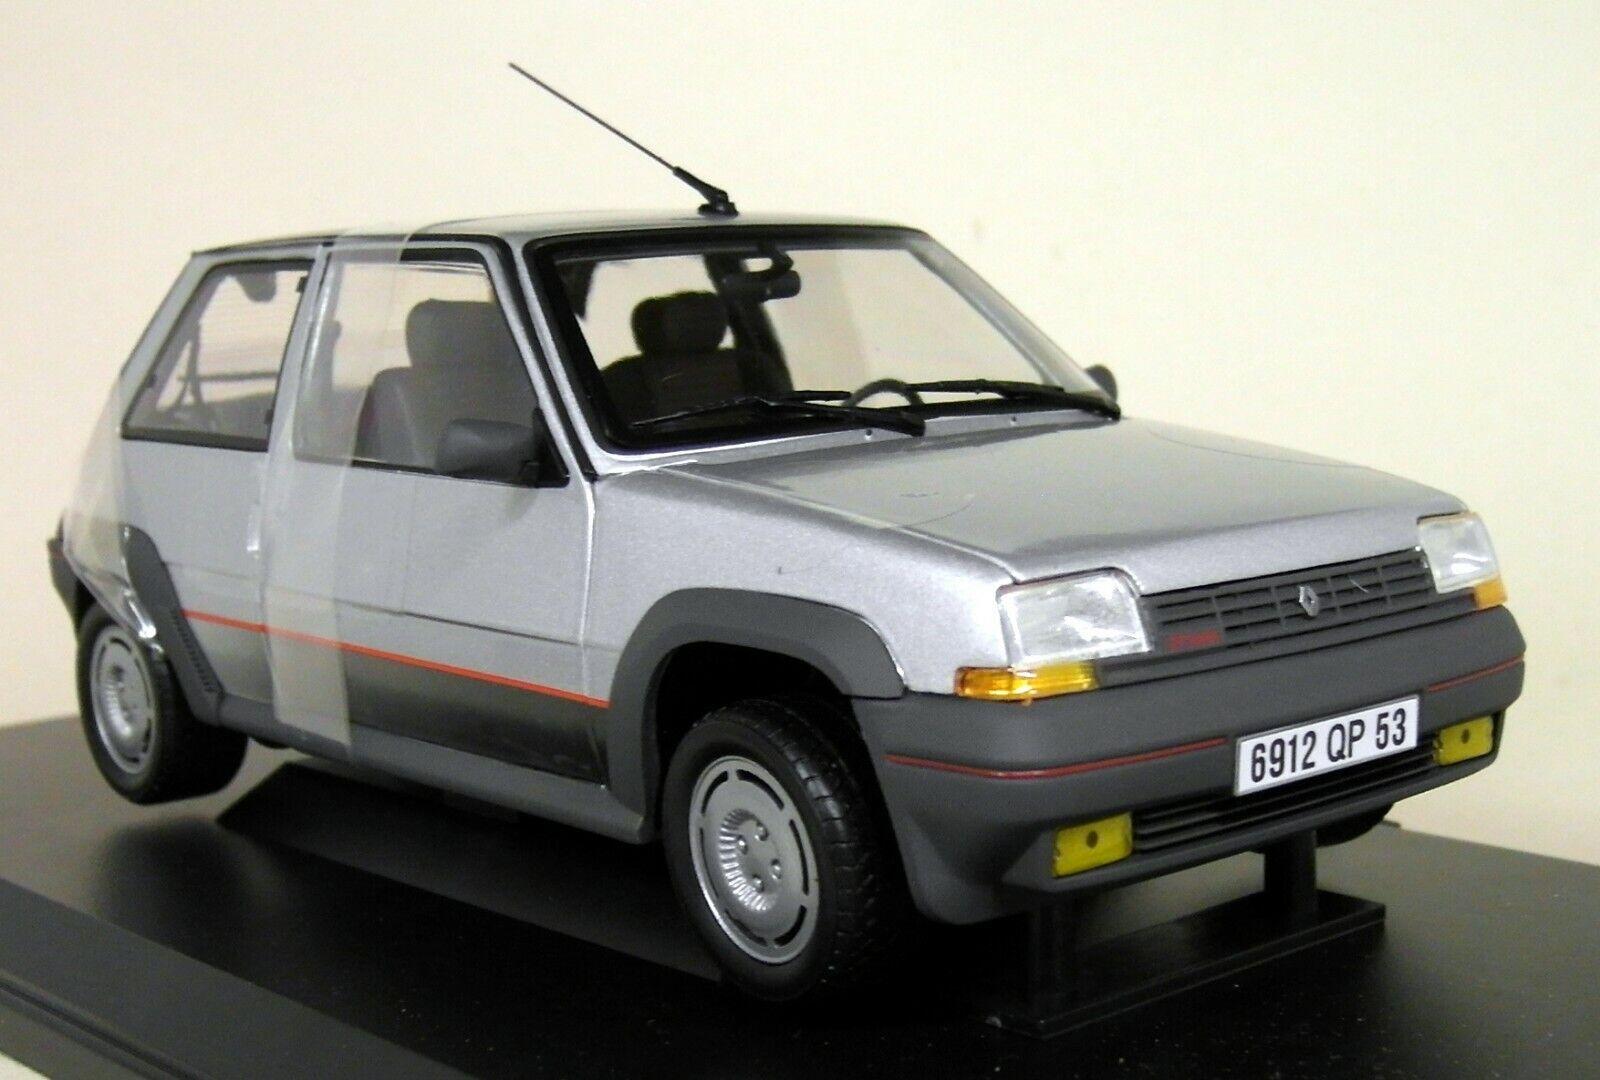 Norev 1 18 Scale - Renault Super Cinq GT Turbo Phase 1 1985 diecast Model Car